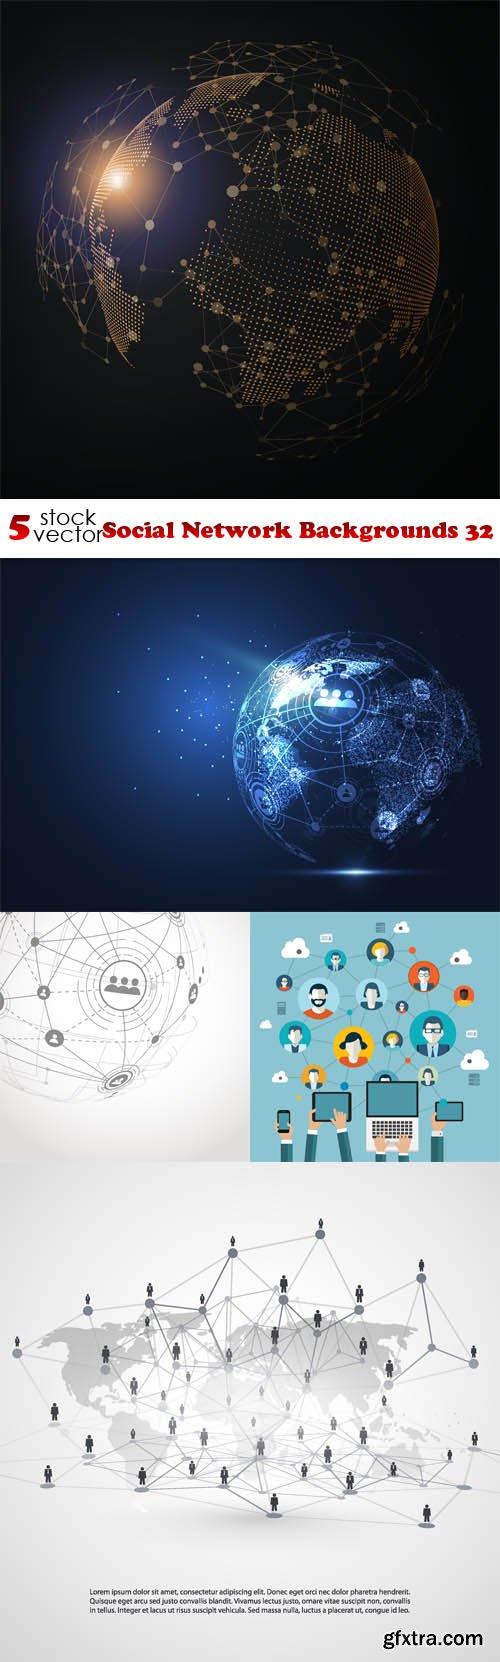 Vectors - Social Network Backgrounds 32